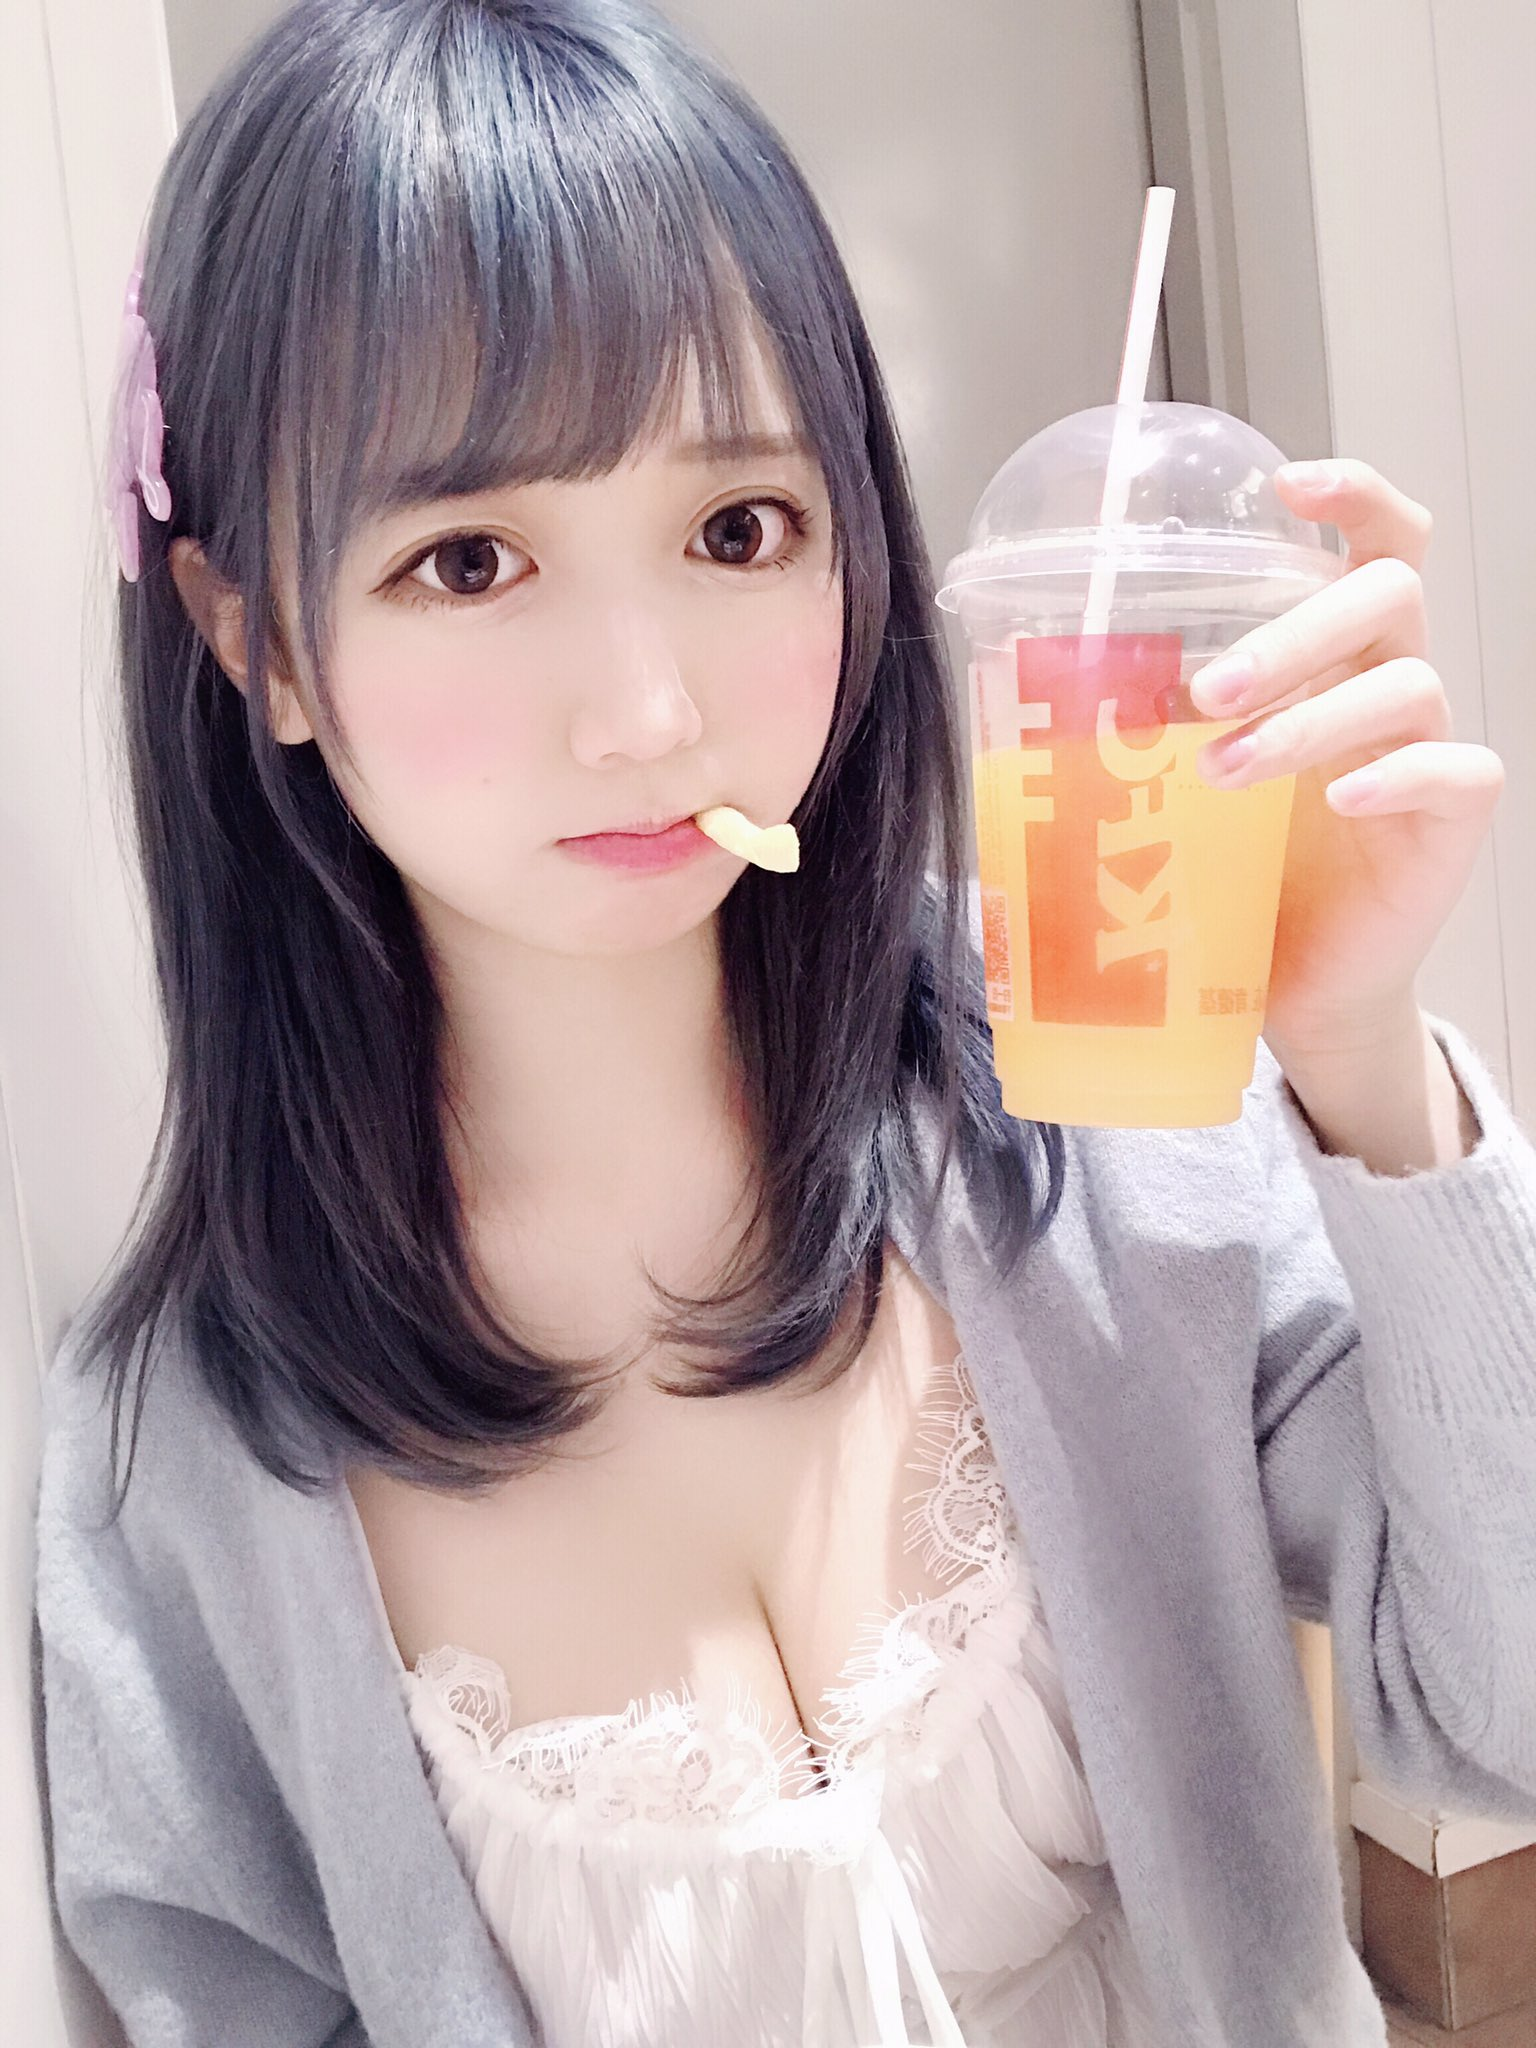 童颜巨乳COSER小姐姐yami推特图集 Yami-twitter9(2)